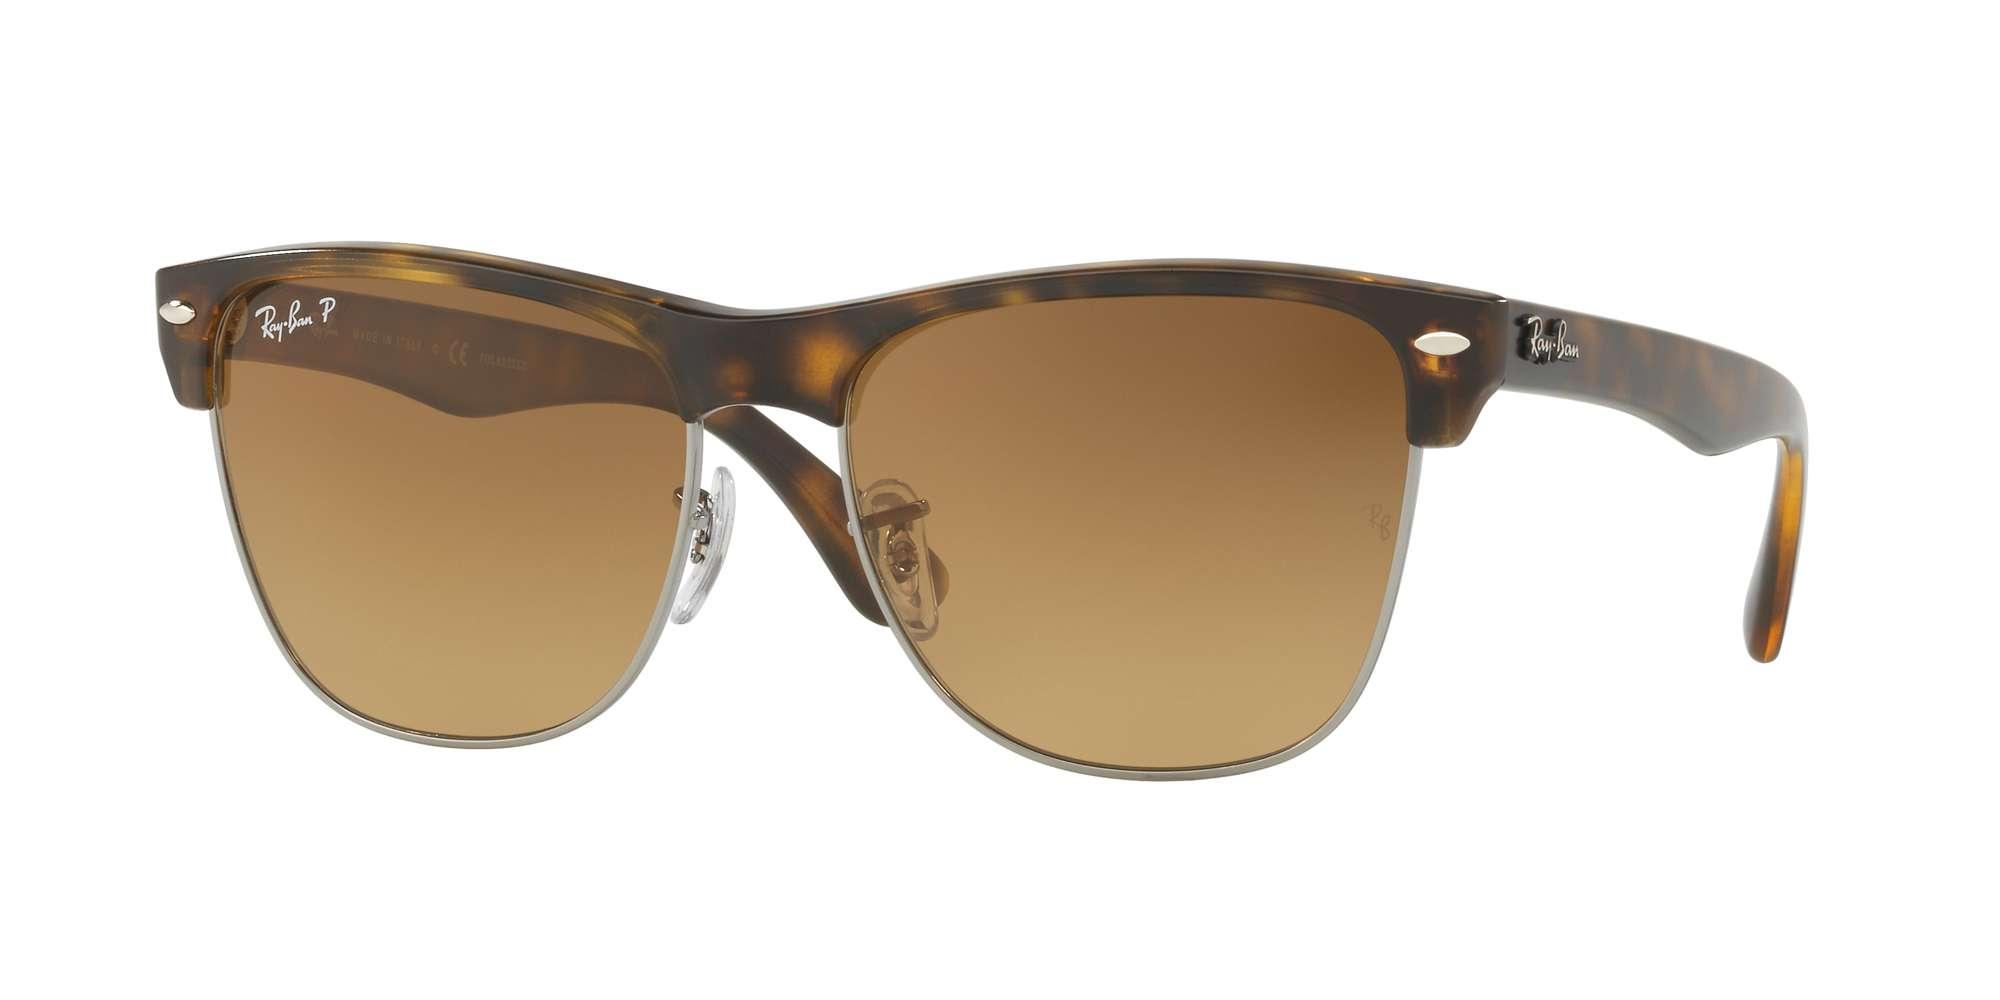 DEMI GLOSS HAVANA / BROWN GRADIENT BROWN - POLAR lenses